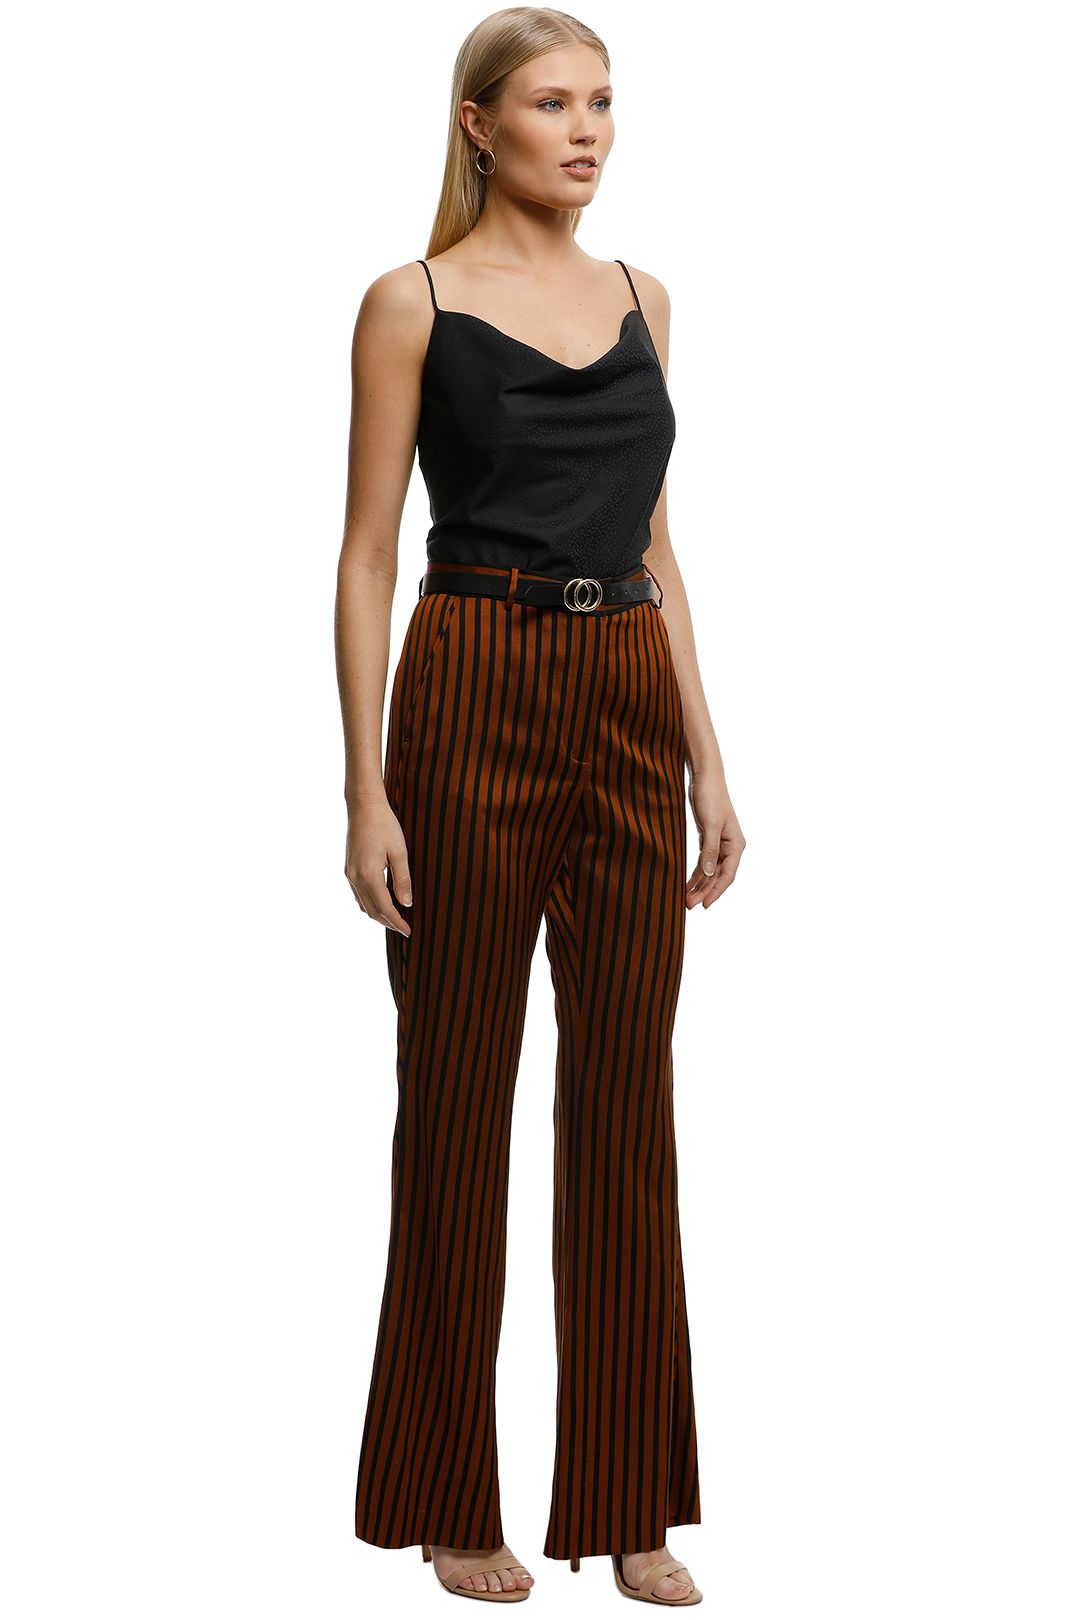 Lover-Liberation-Stripe-Pant-Chestnut-Stripe-Side